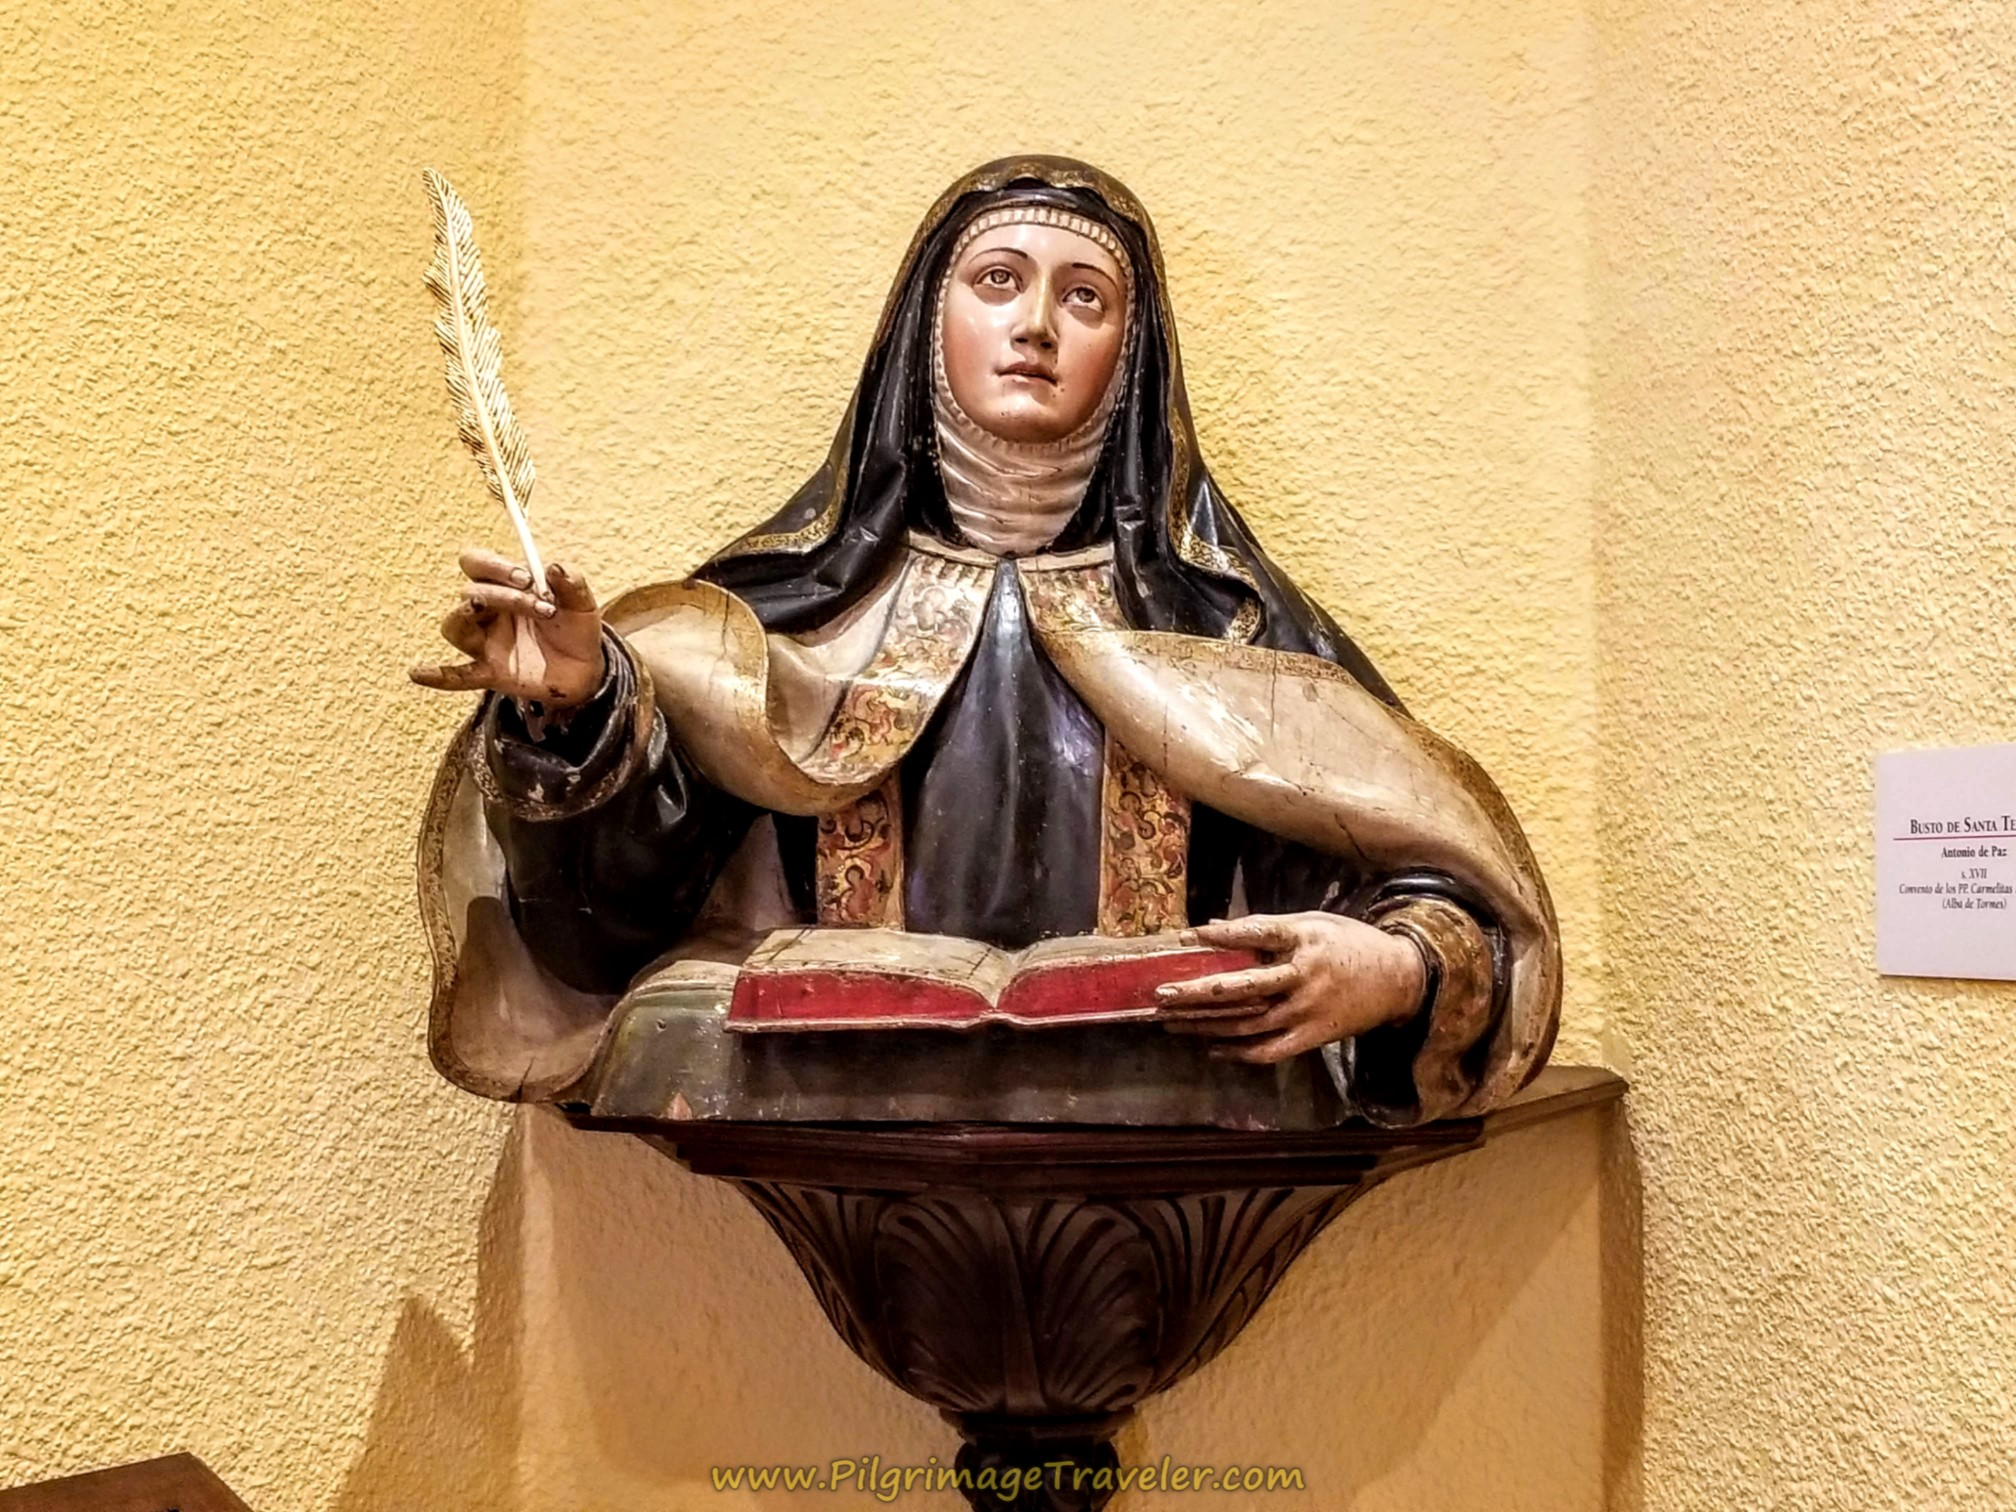 Carving of St. Teresa, Centro Teresiano Sanjuanista, Alba de Tormes